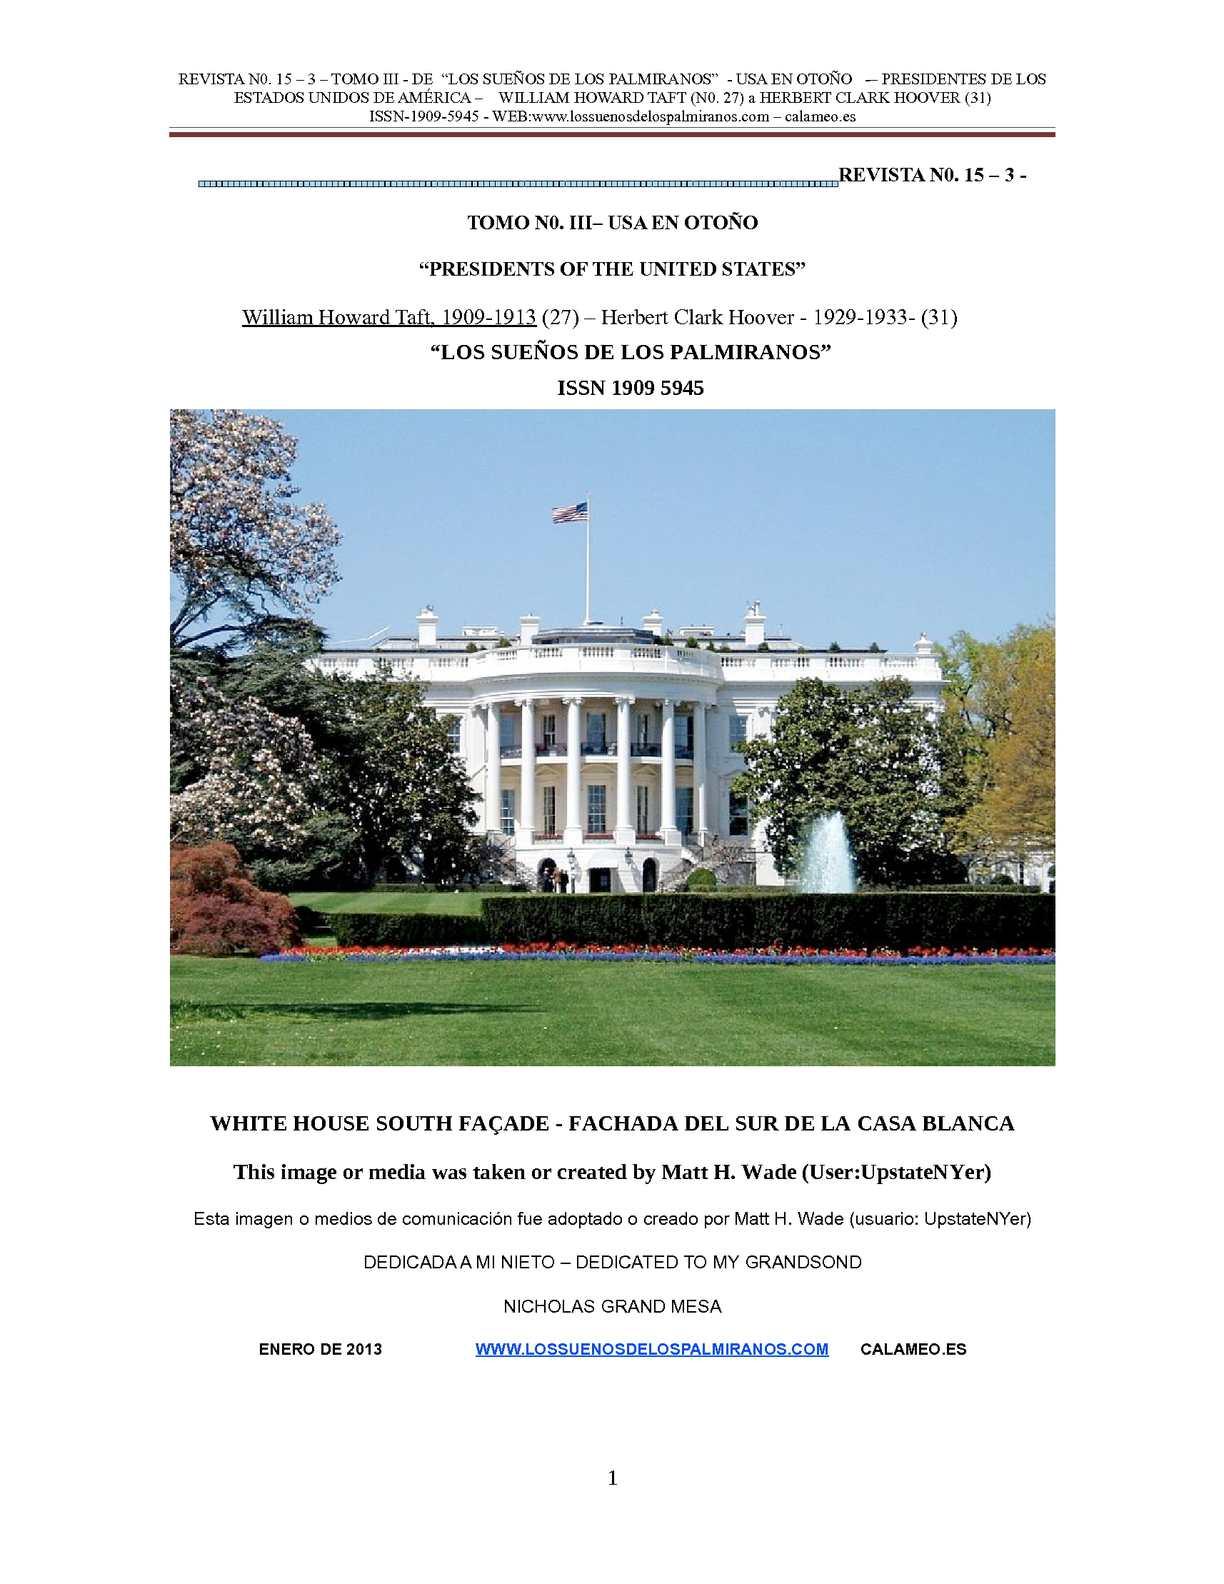 Calaméo - REVISTA N0. 15-3 - TOMO III - PRESIDENTES USA - WILLIAM ...